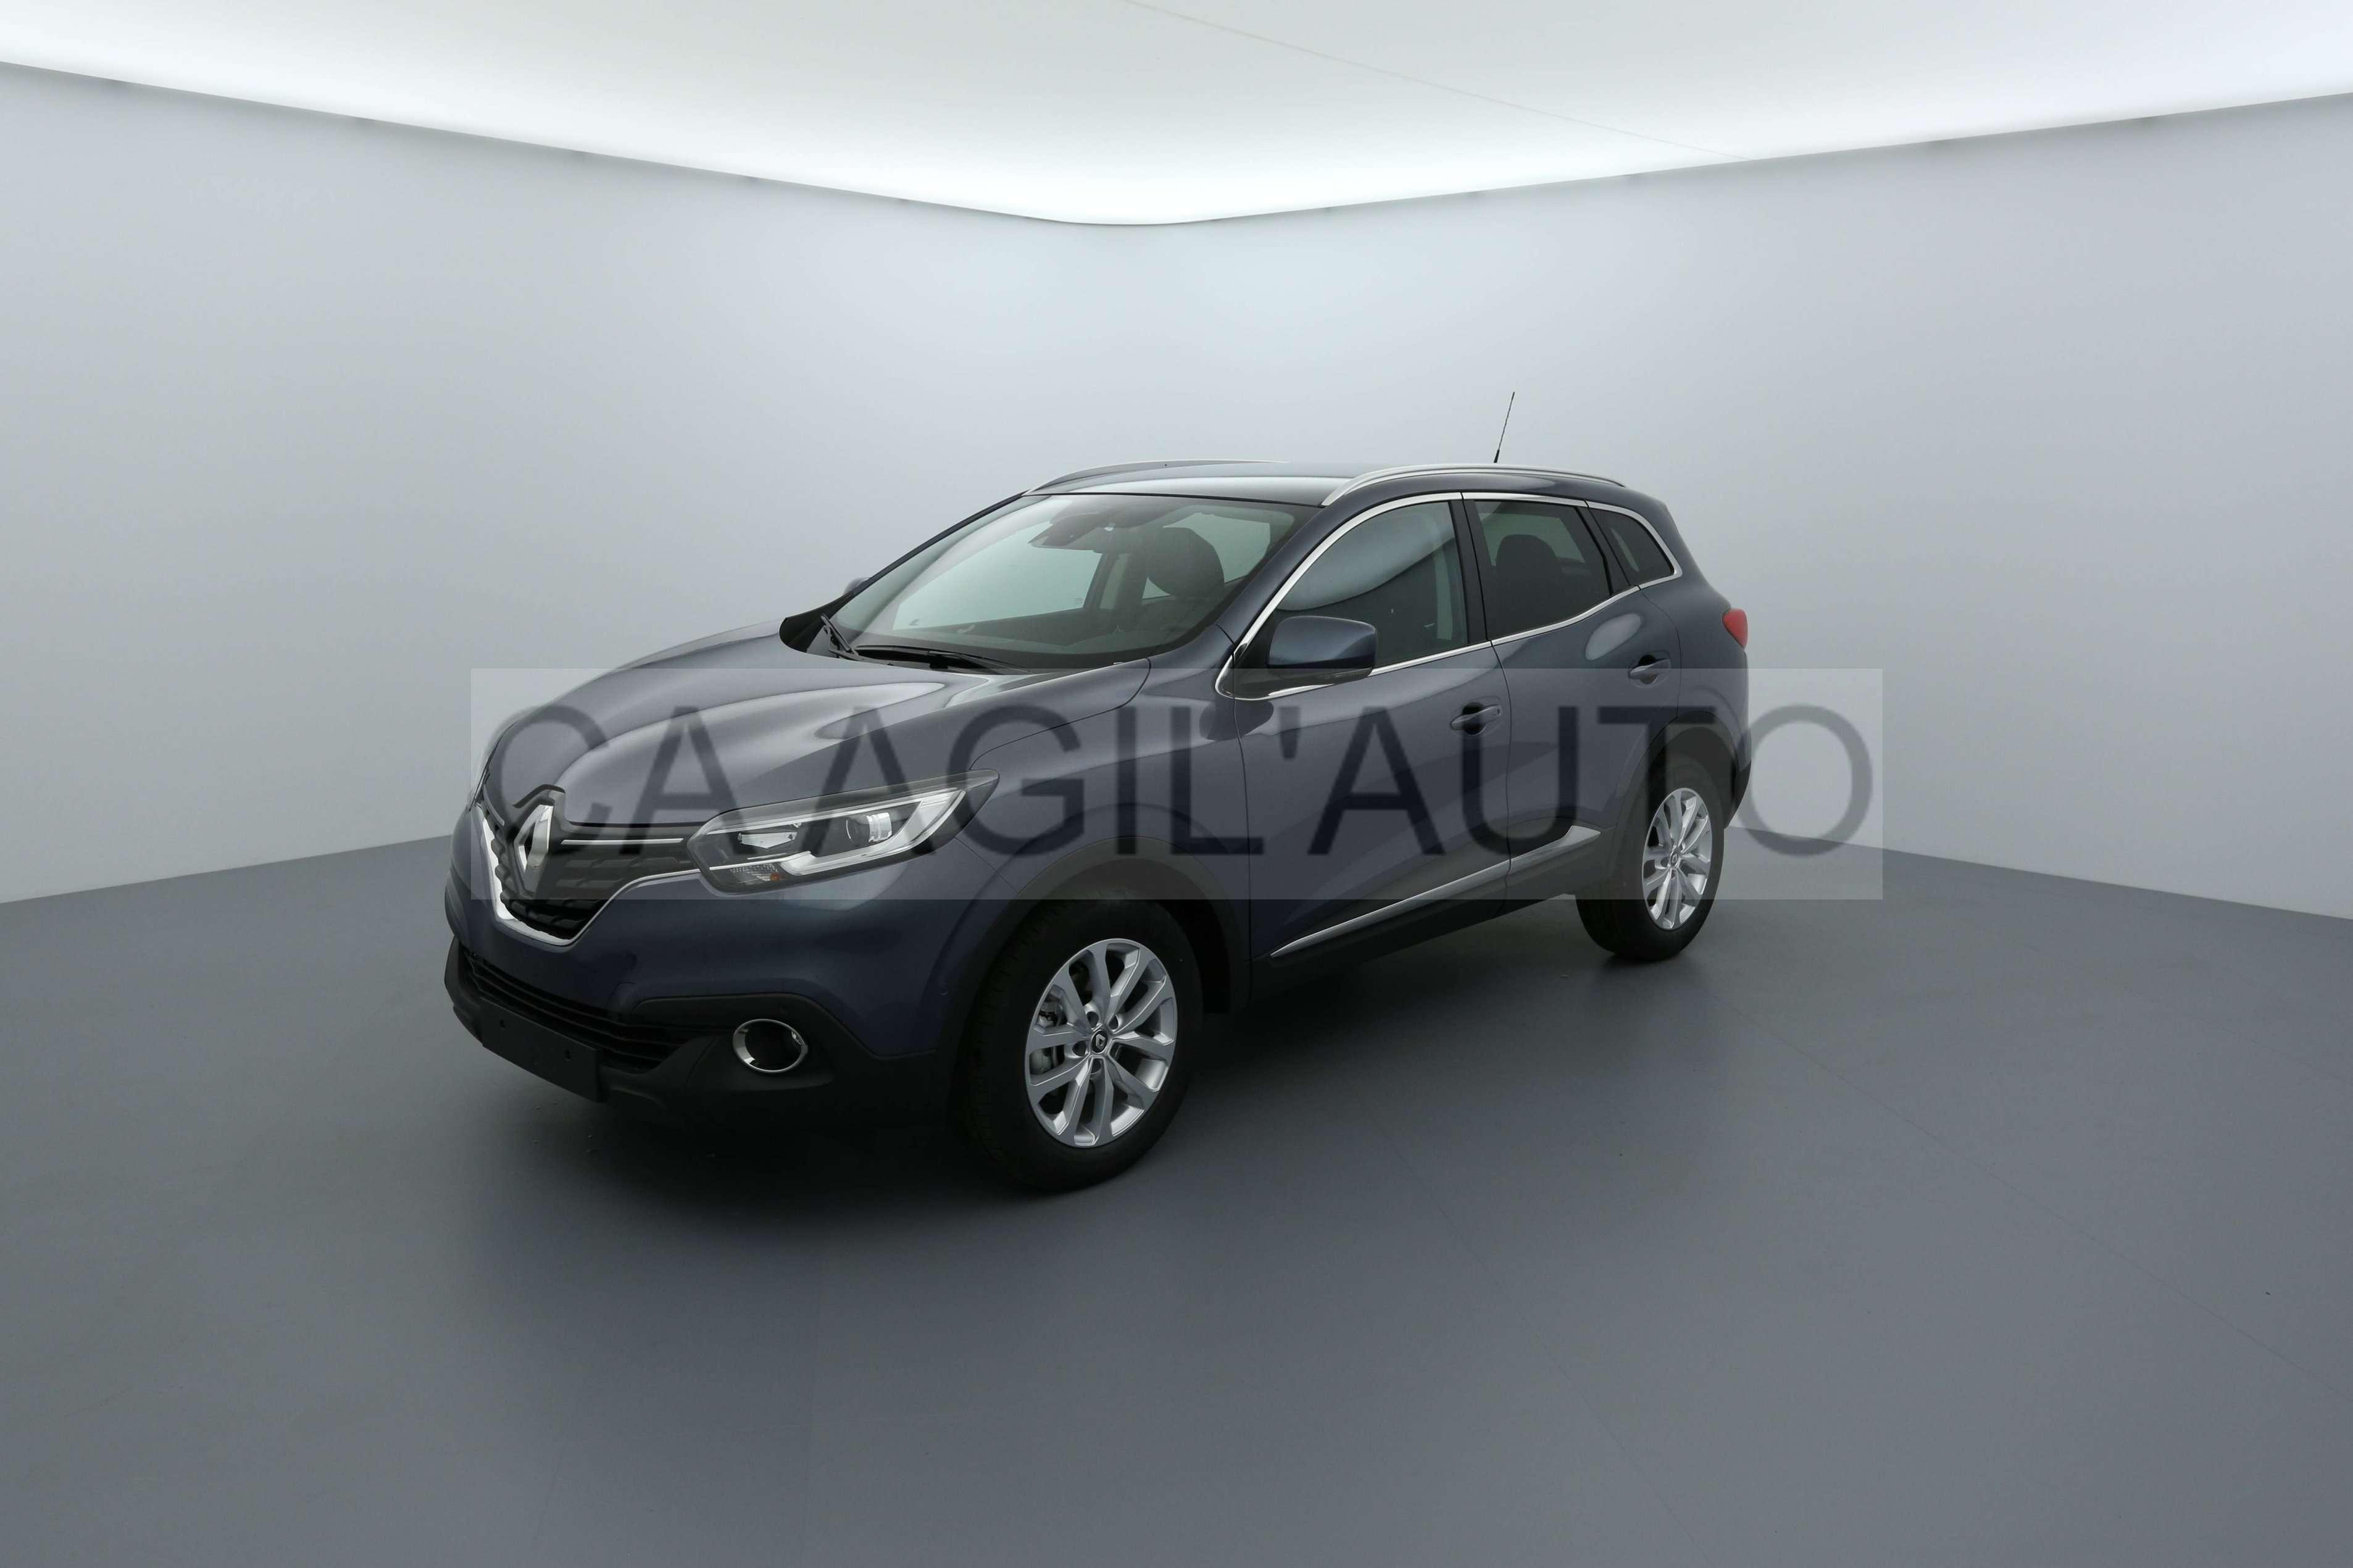 Renault Kadjar Massy Cedex 11807294 Ca Agilauto